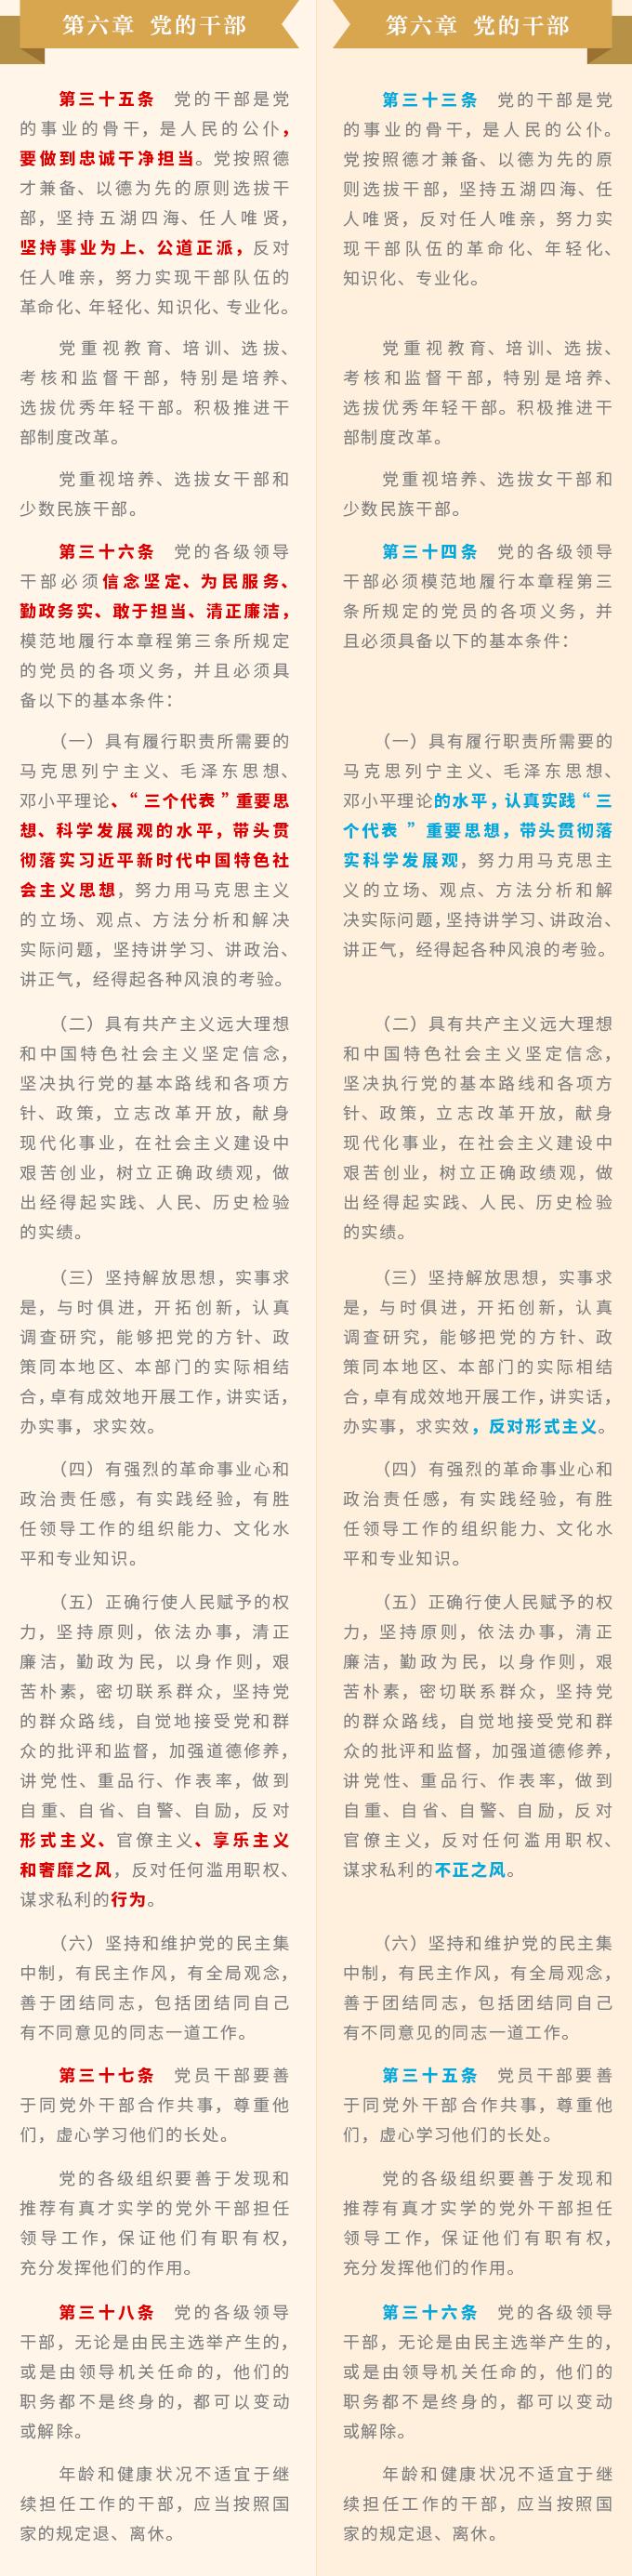 http://www.ccdi.gov.cn/yw/201710/W020171031664658021440.png